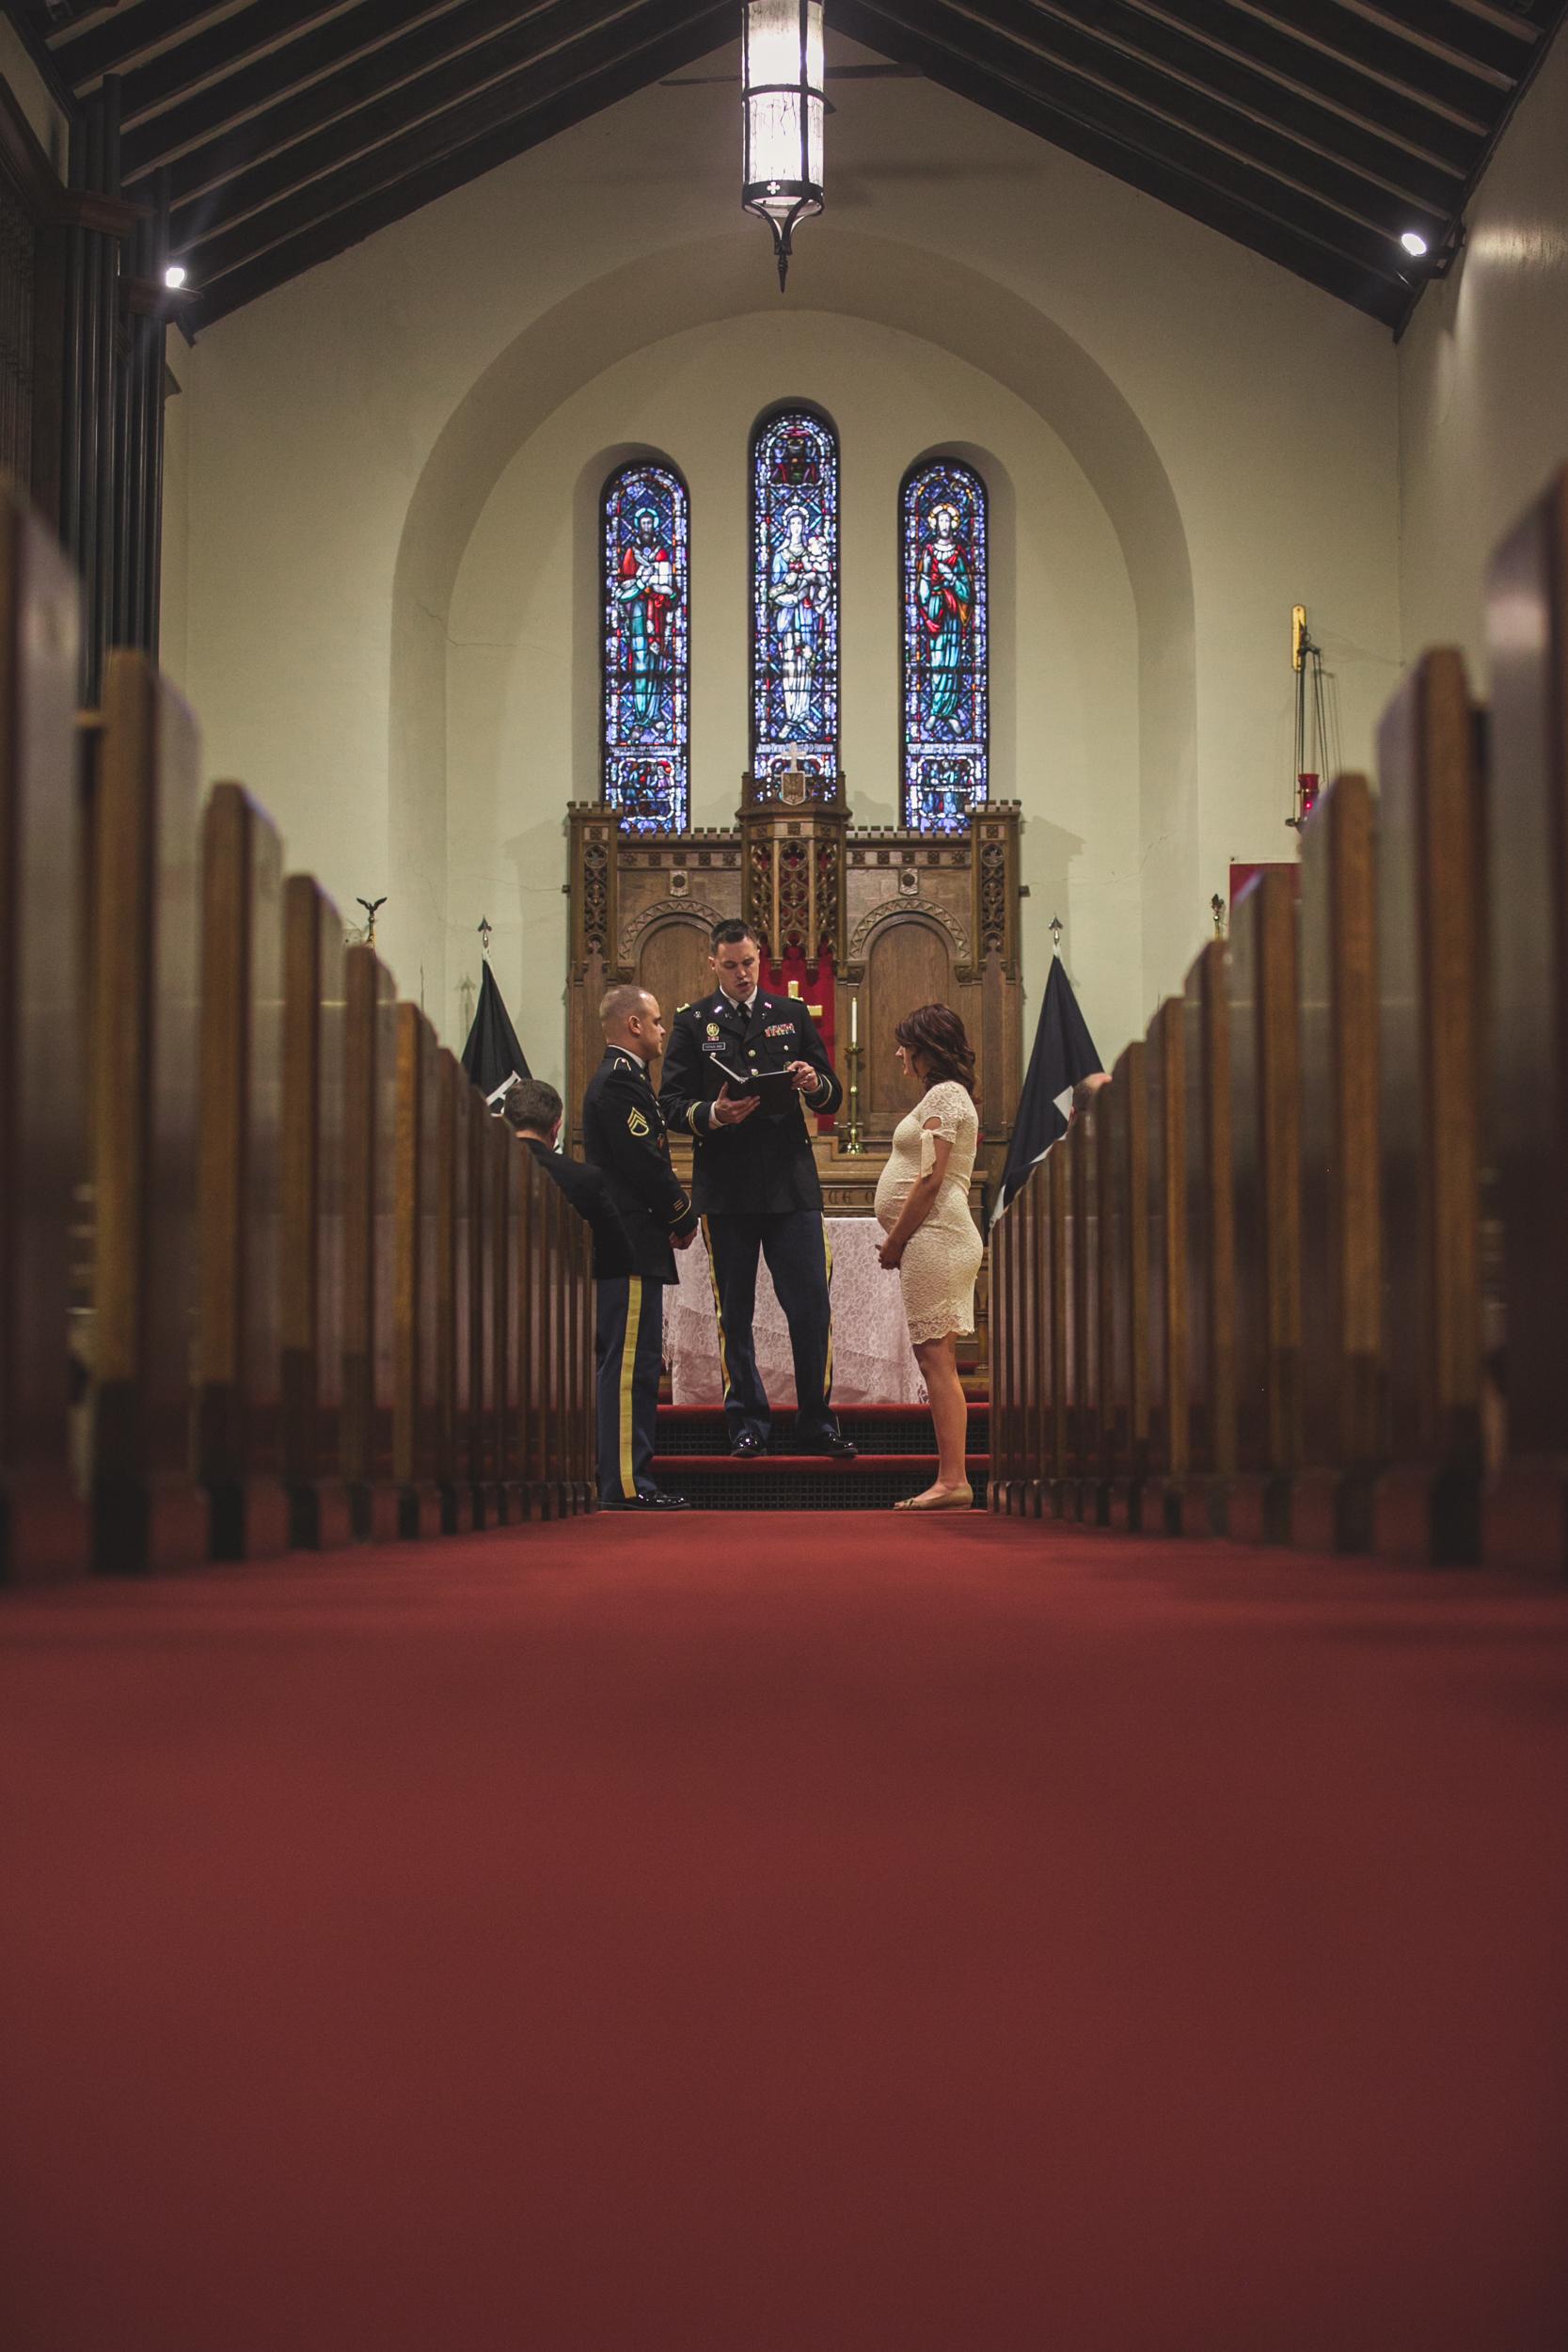 Fort Snelling Elopement St. Paul, MN, Fort Snelling Elopement, Military Elopement, Intimate Military Wedding, intimate elopement wedding-www.rachelsmak.com27.jpg